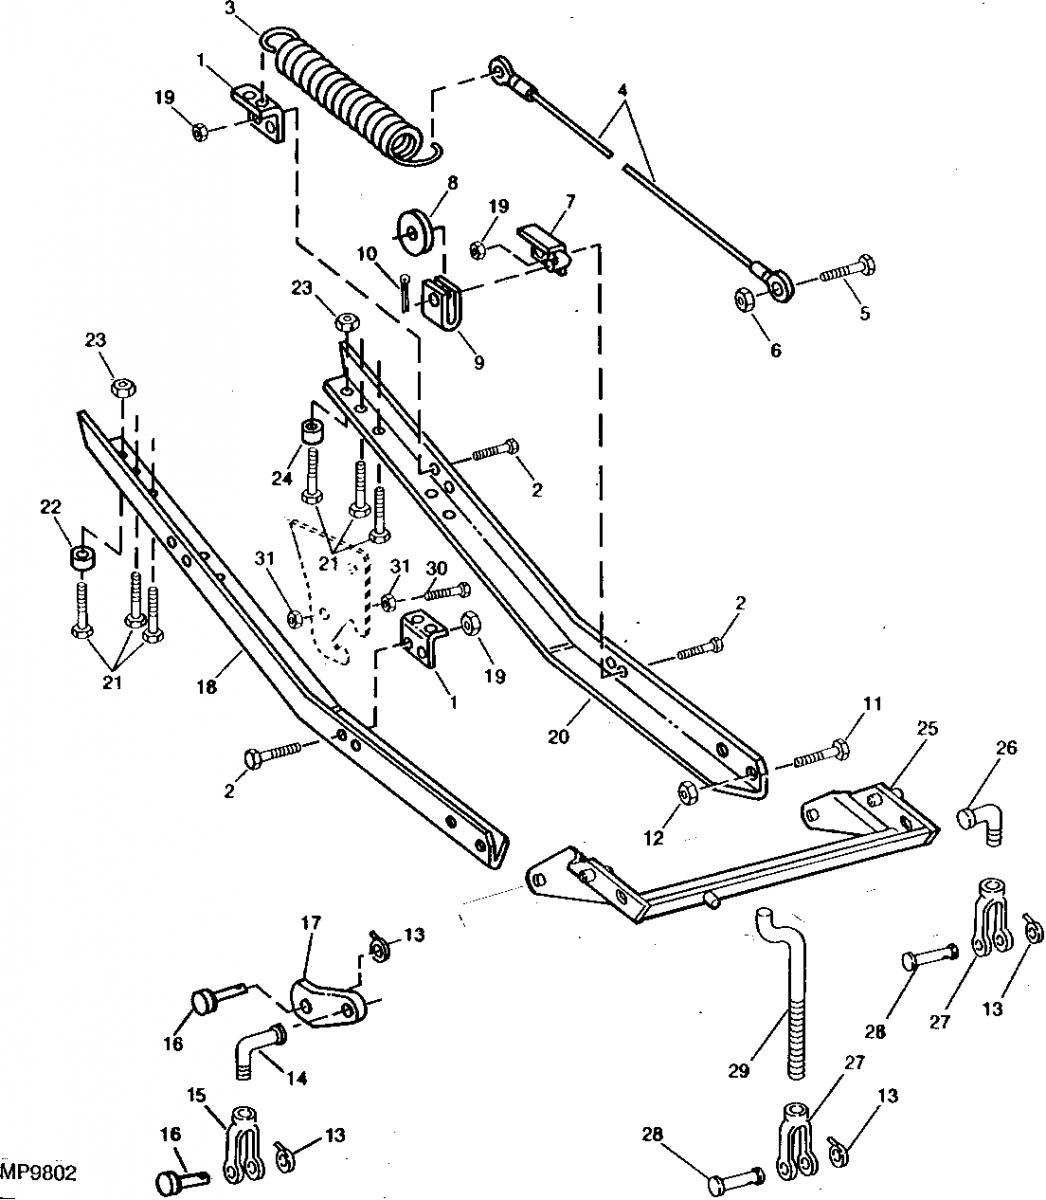 Help! John Deere 38 inch snowthrower support bracket